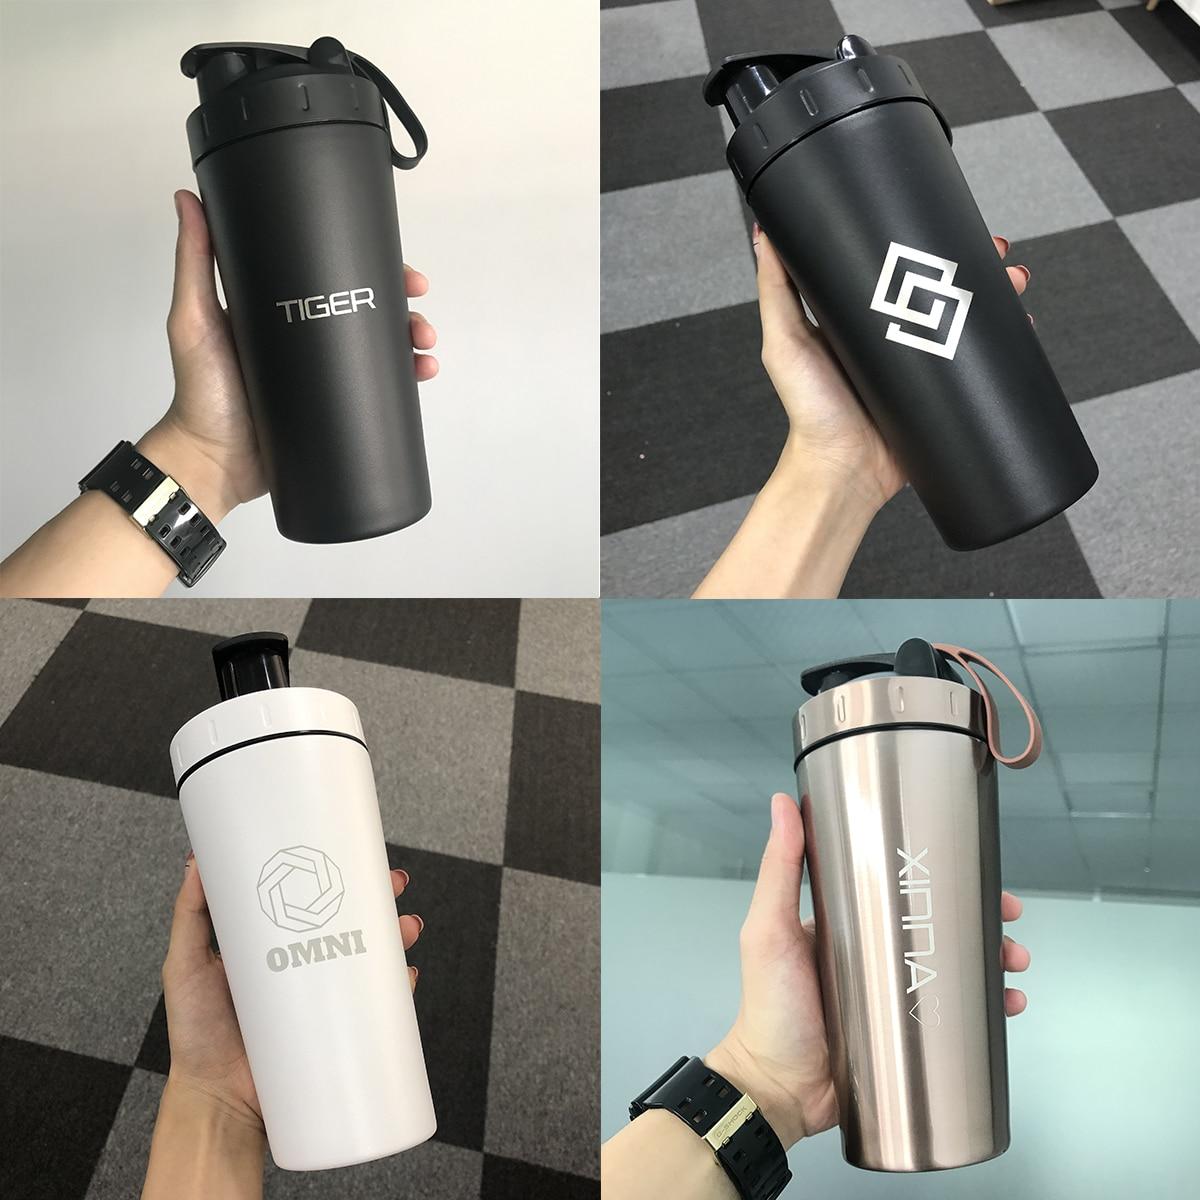 H4b84a4264c244b60856ea939dbc133d5p 28OZ Whey Protein Powder Sports Shaker Bottle For Water Bottles Gym Nutrition Blender Cup Stainless Steel Vacuum Insulation